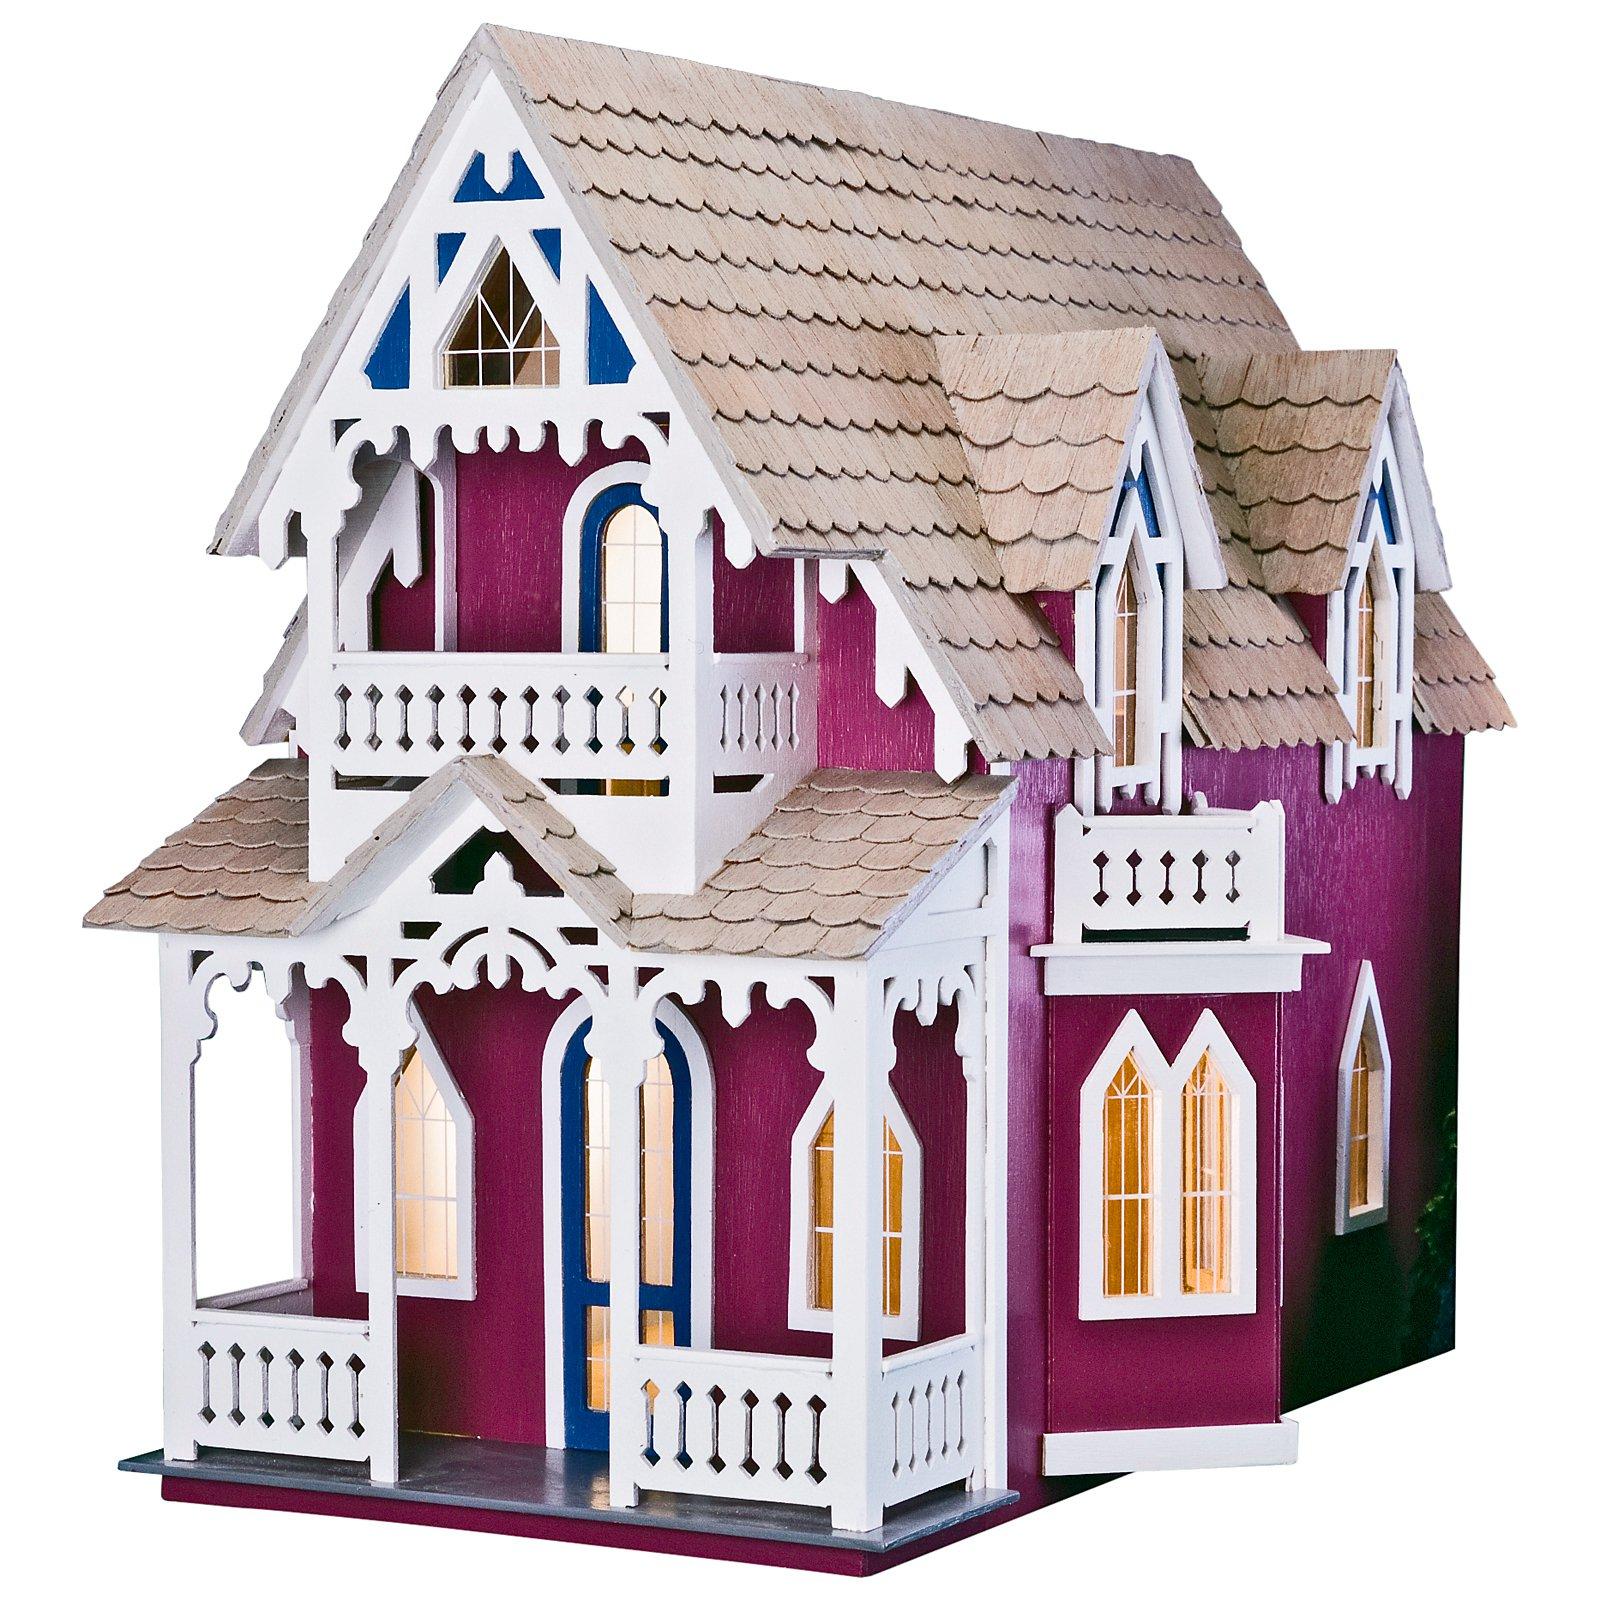 Greenleaf Vineyard Cottage Dollhouse Kit - 1 Inch Scale